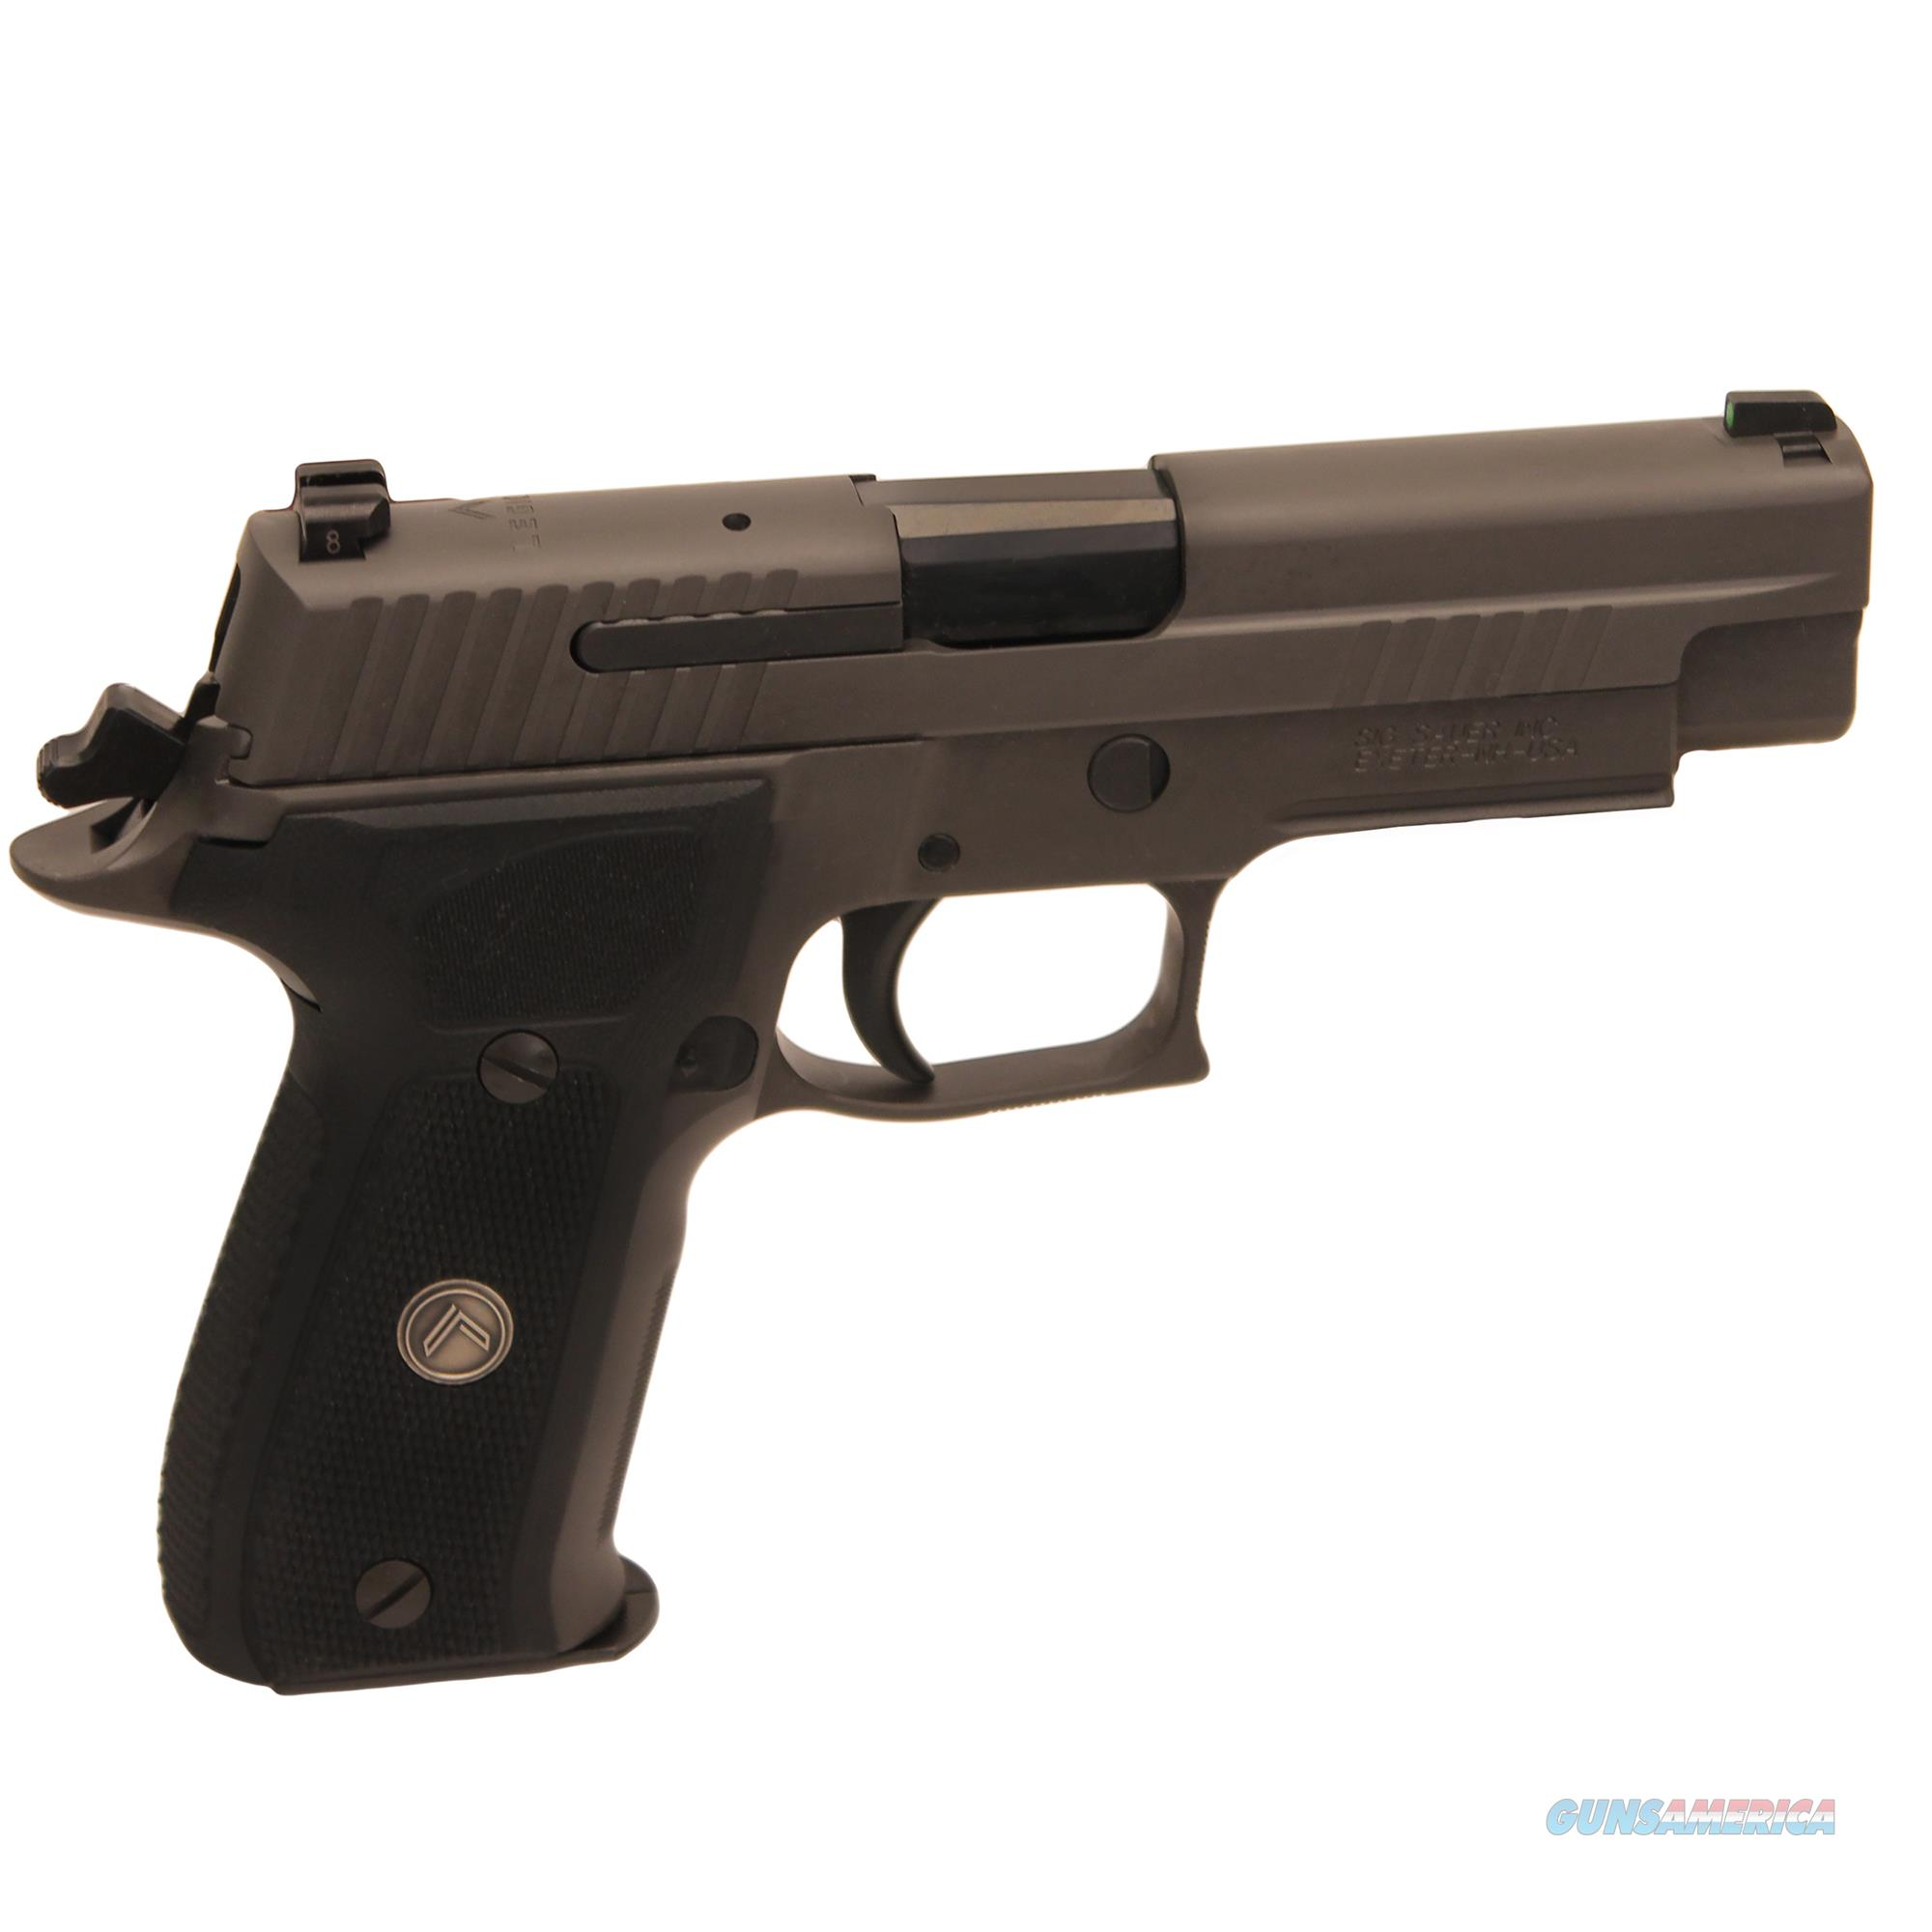 Sig Sauer 226R Legion E26R-40-LEGION  Guns > Pistols > S Misc Pistols